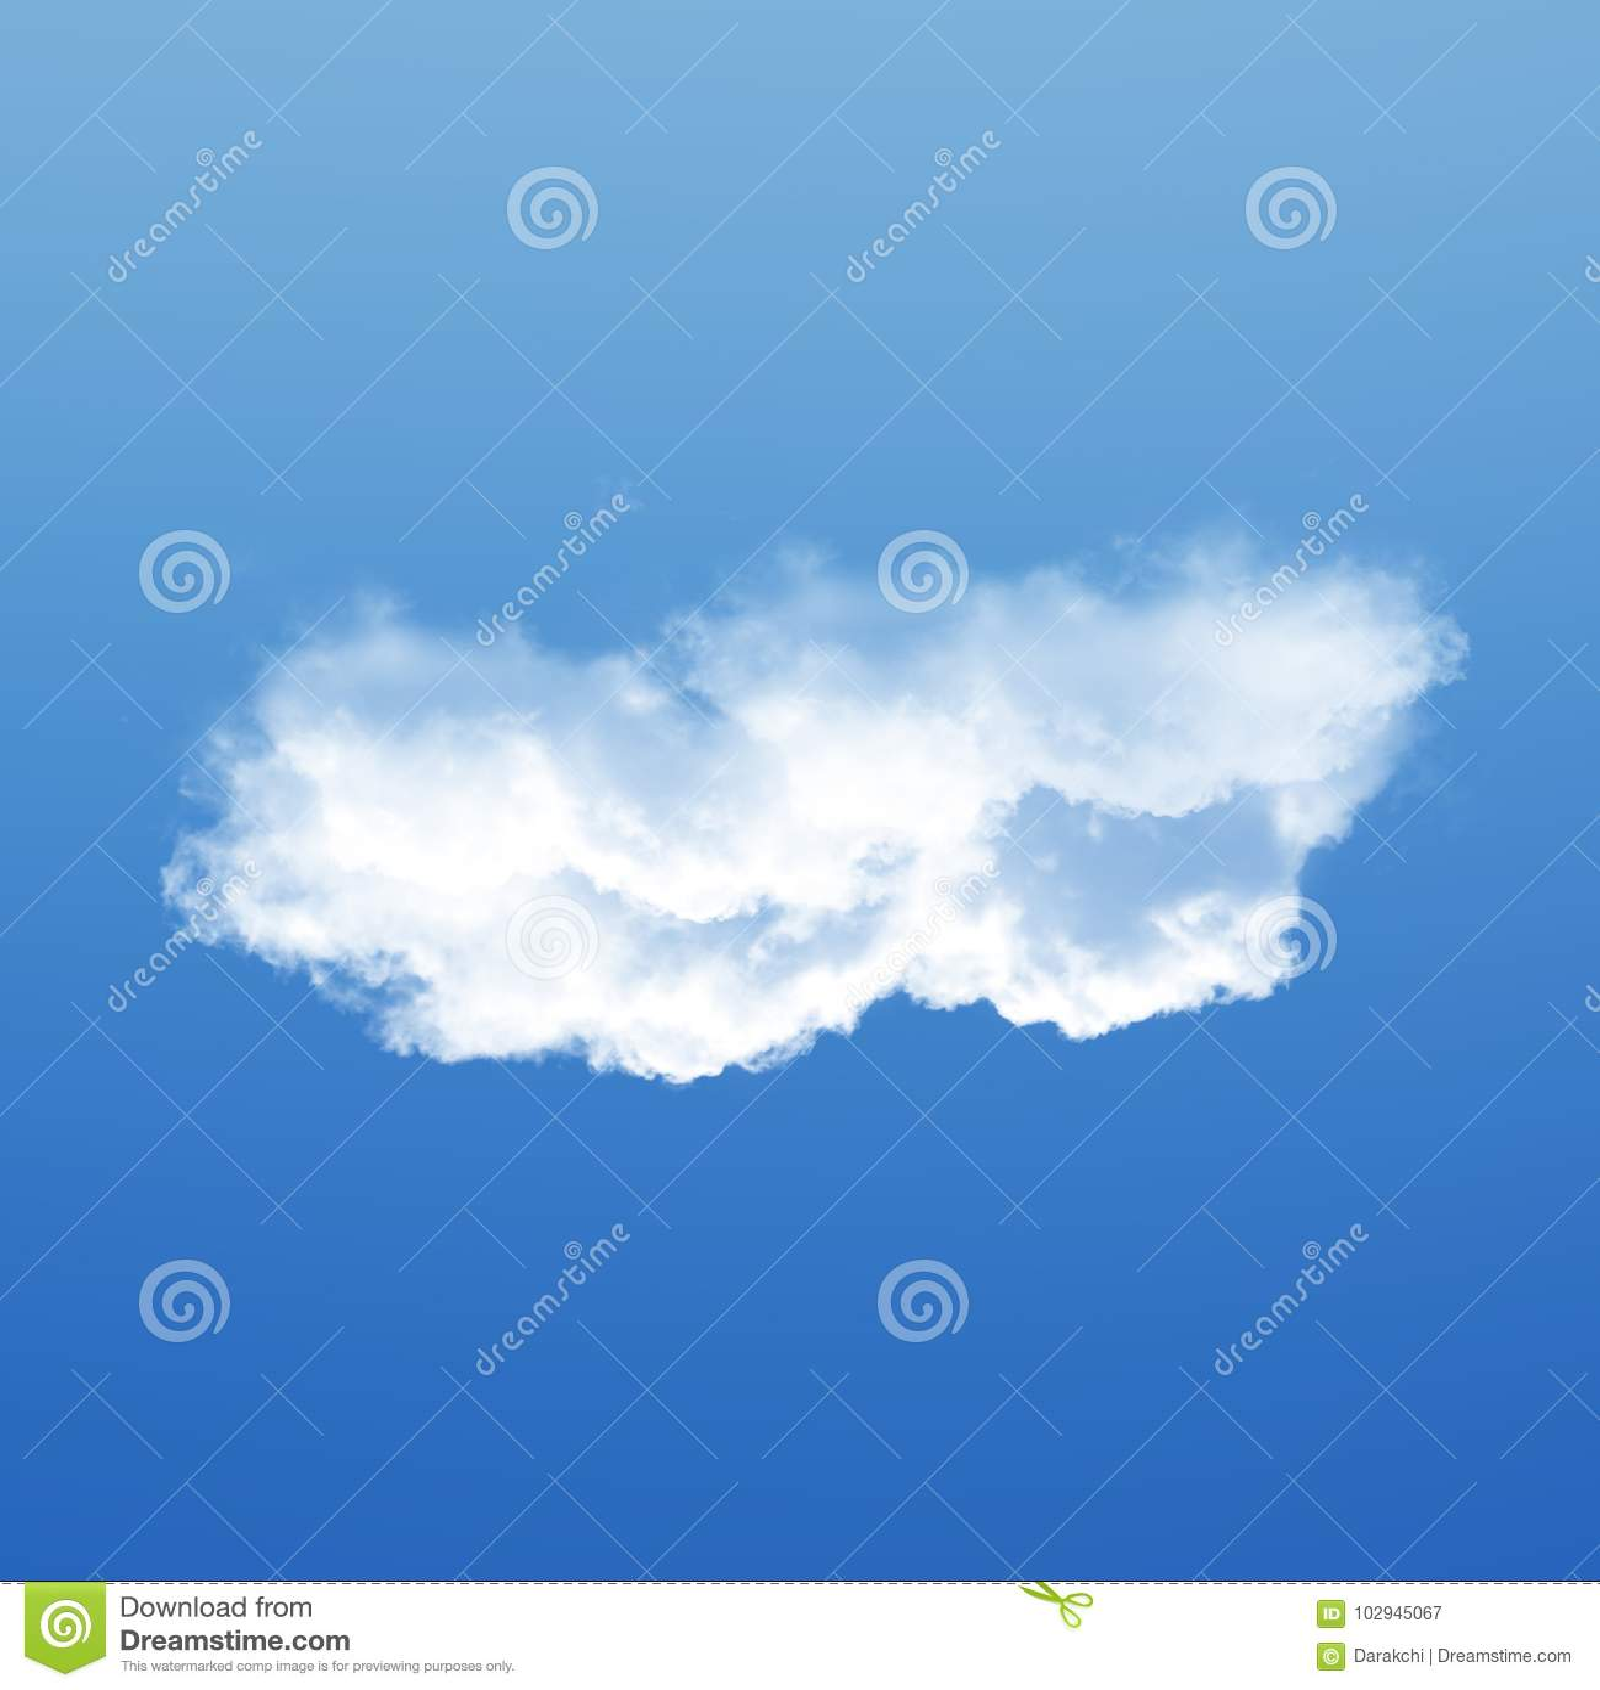 Wolk over blauwe hemel 3D enige die illustratie wordt geïsoleerd als achtergrond,